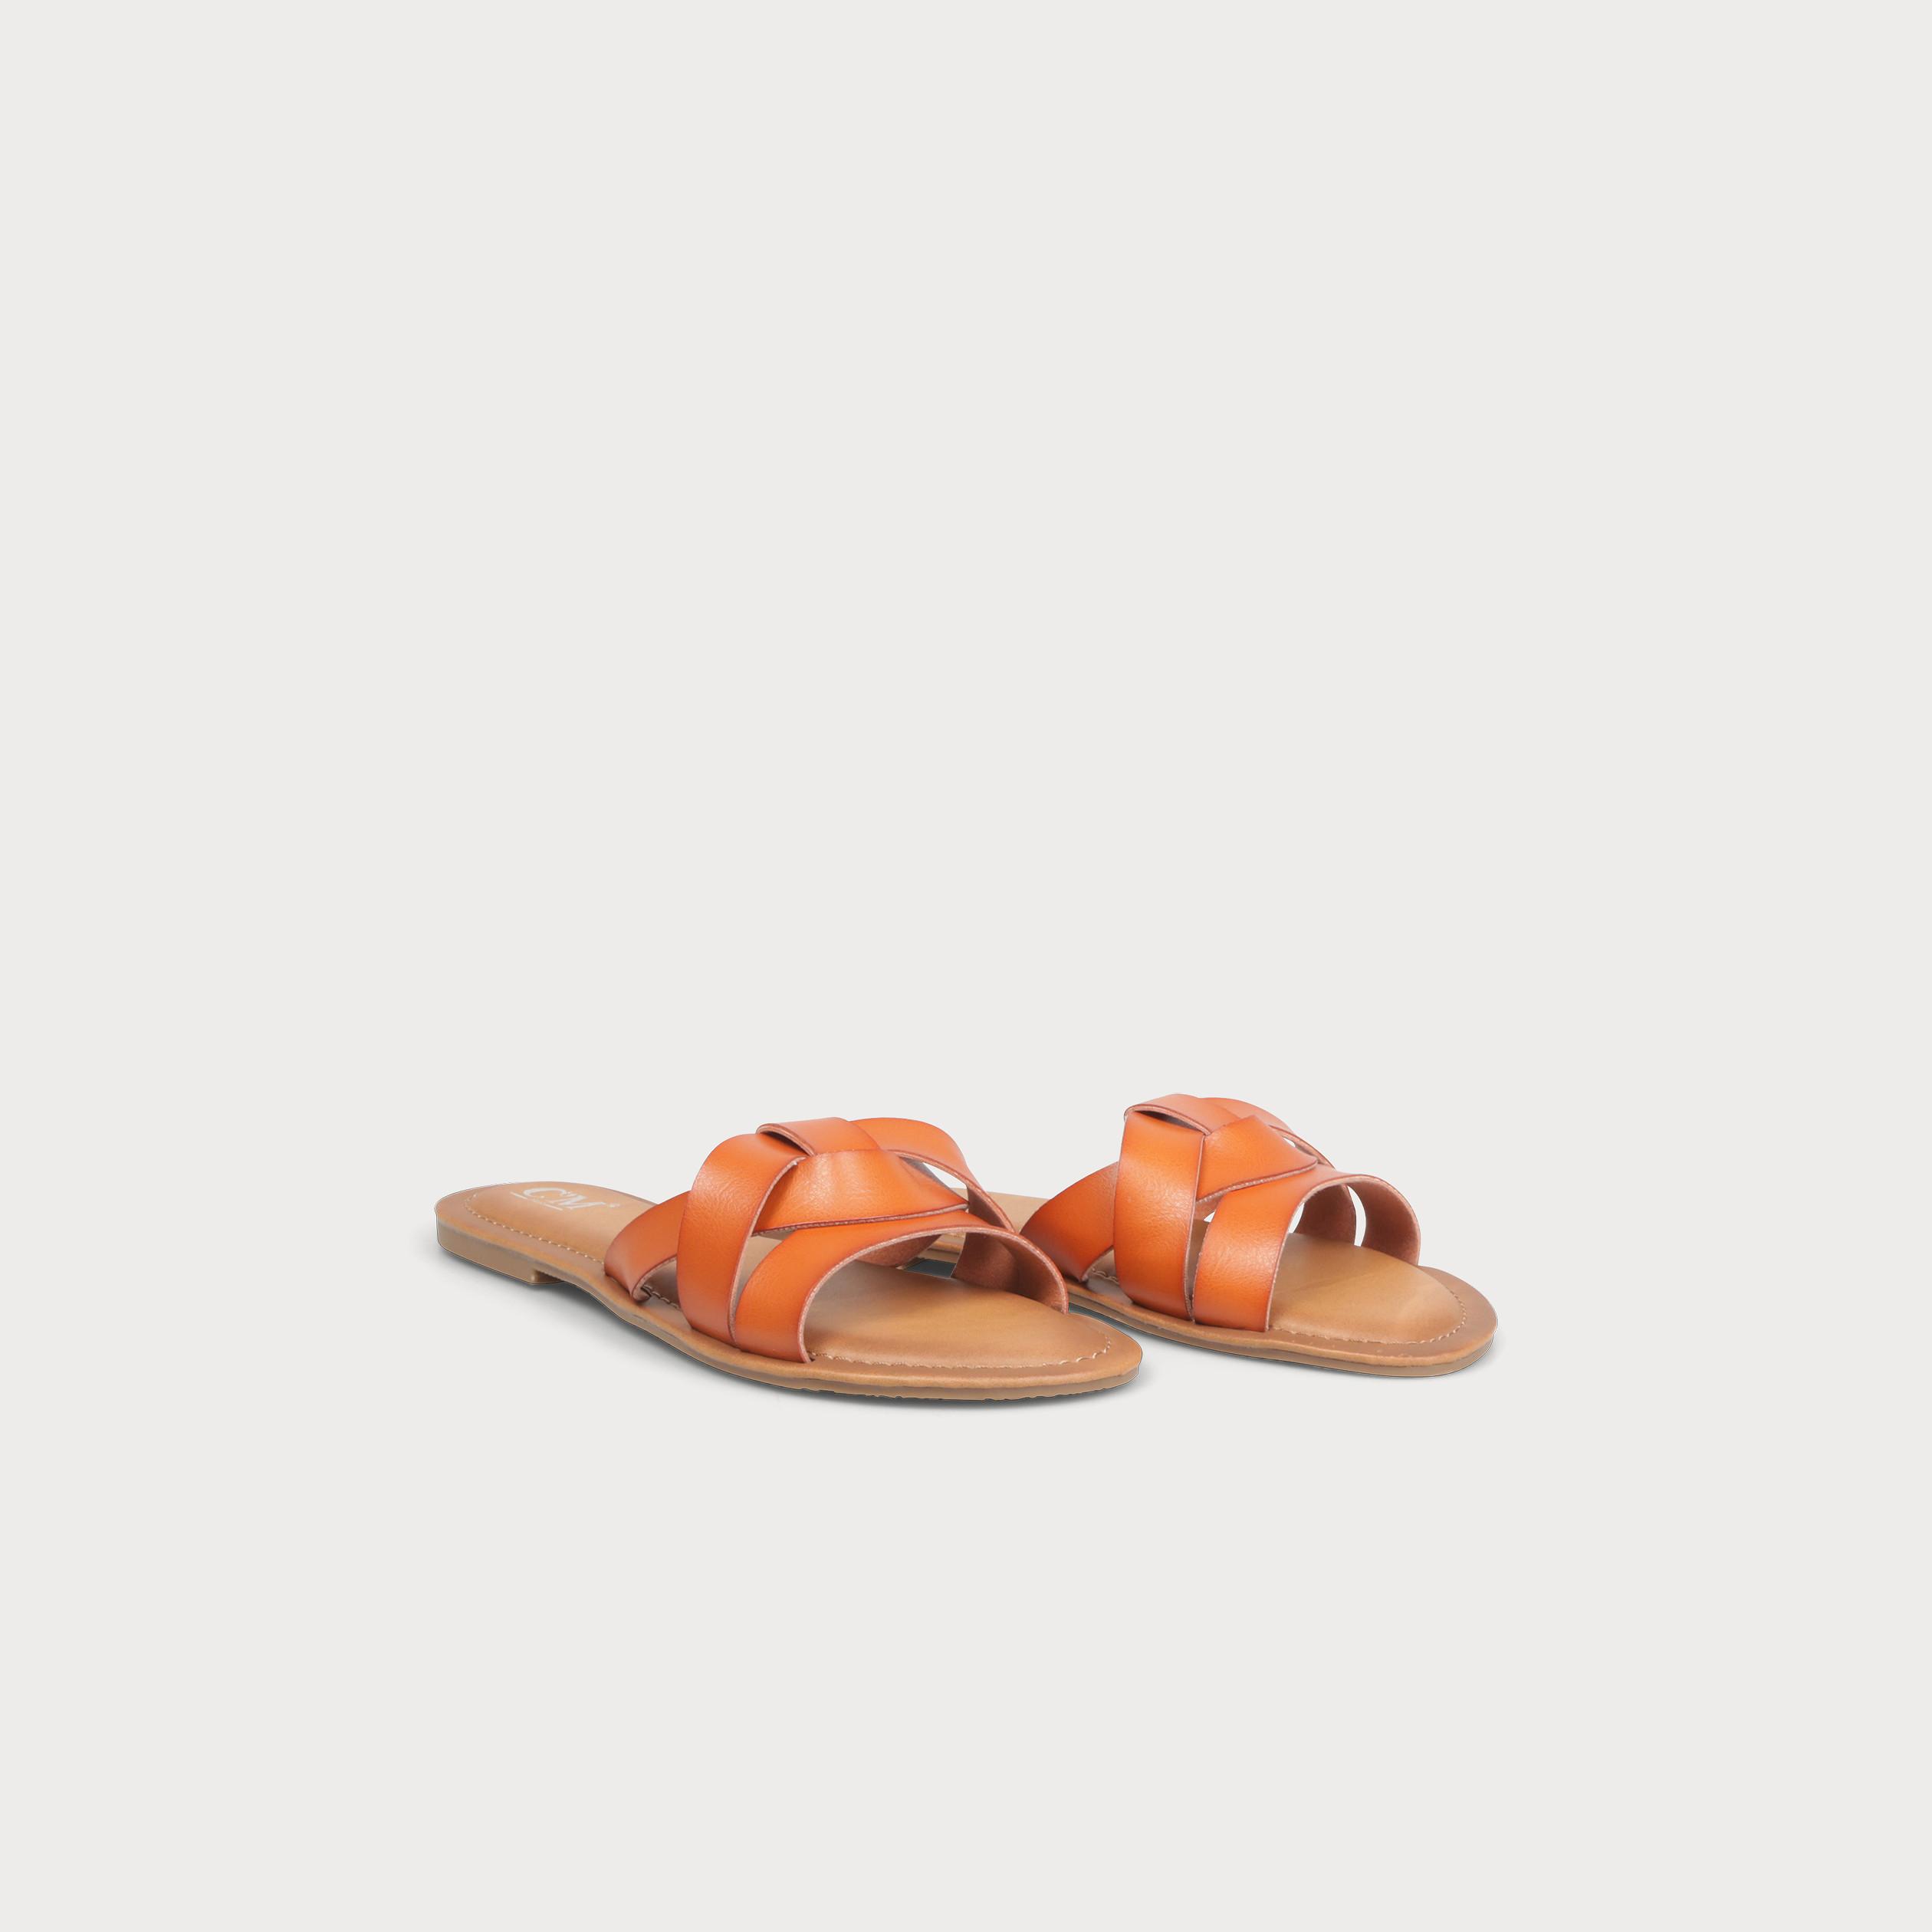 7560b533f3202b Sandales plates multibrides camel femme | Vib's